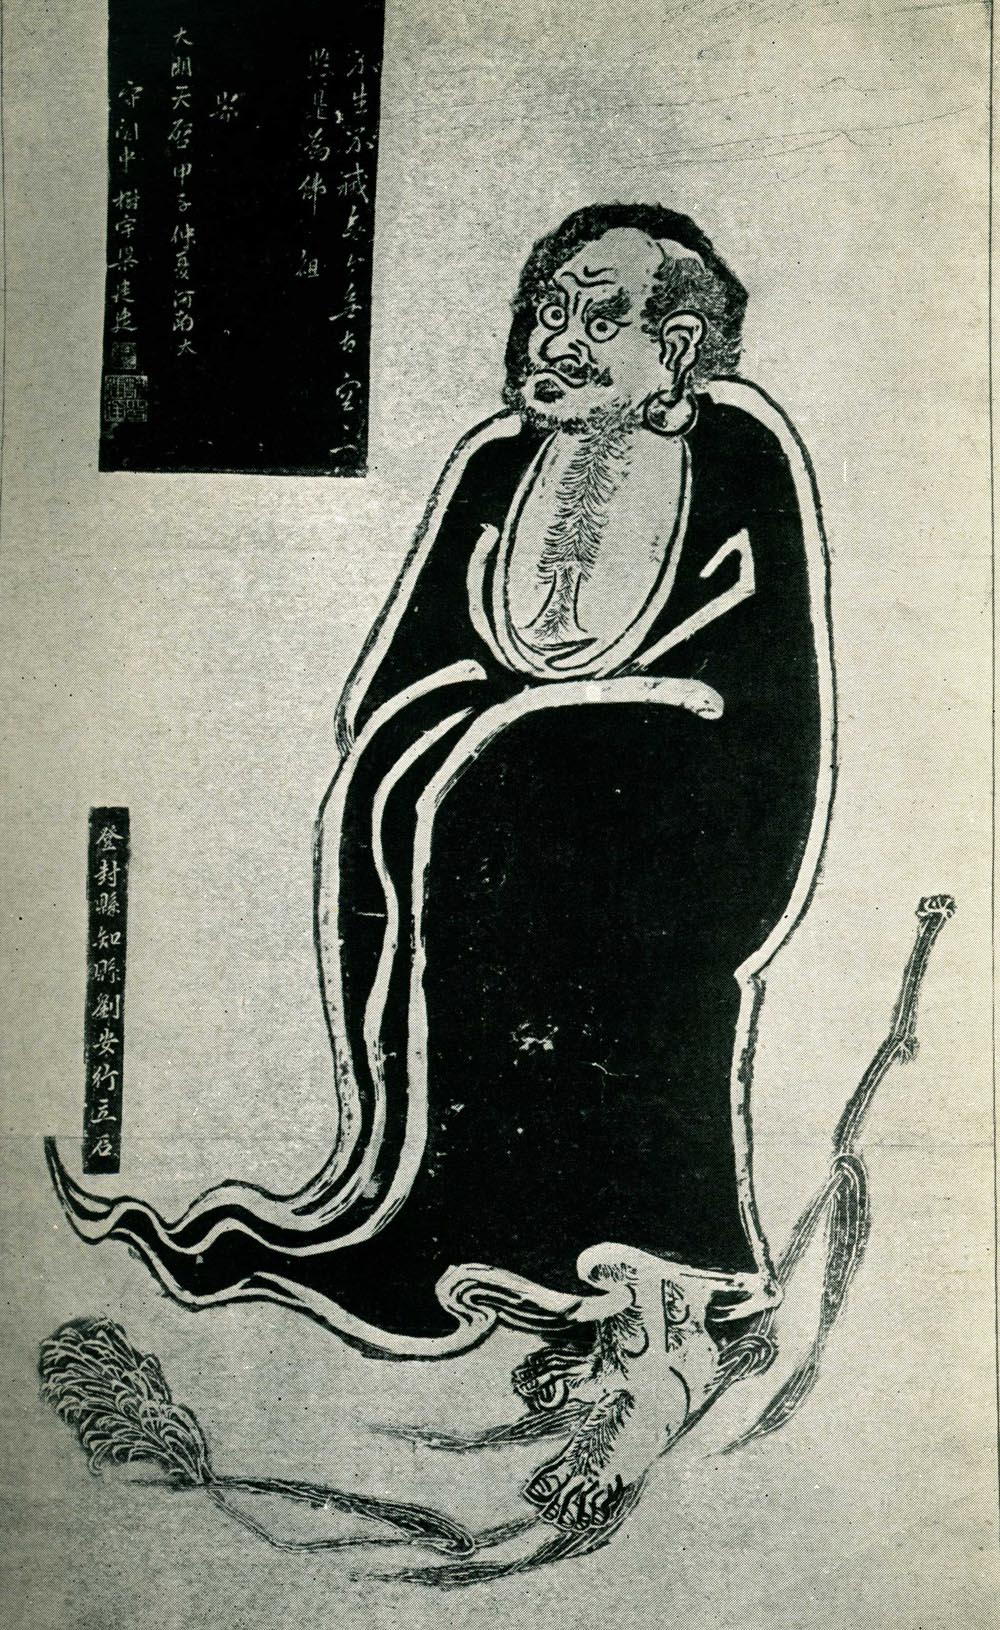 Bodhidharma, Founder of Chan Buddhism